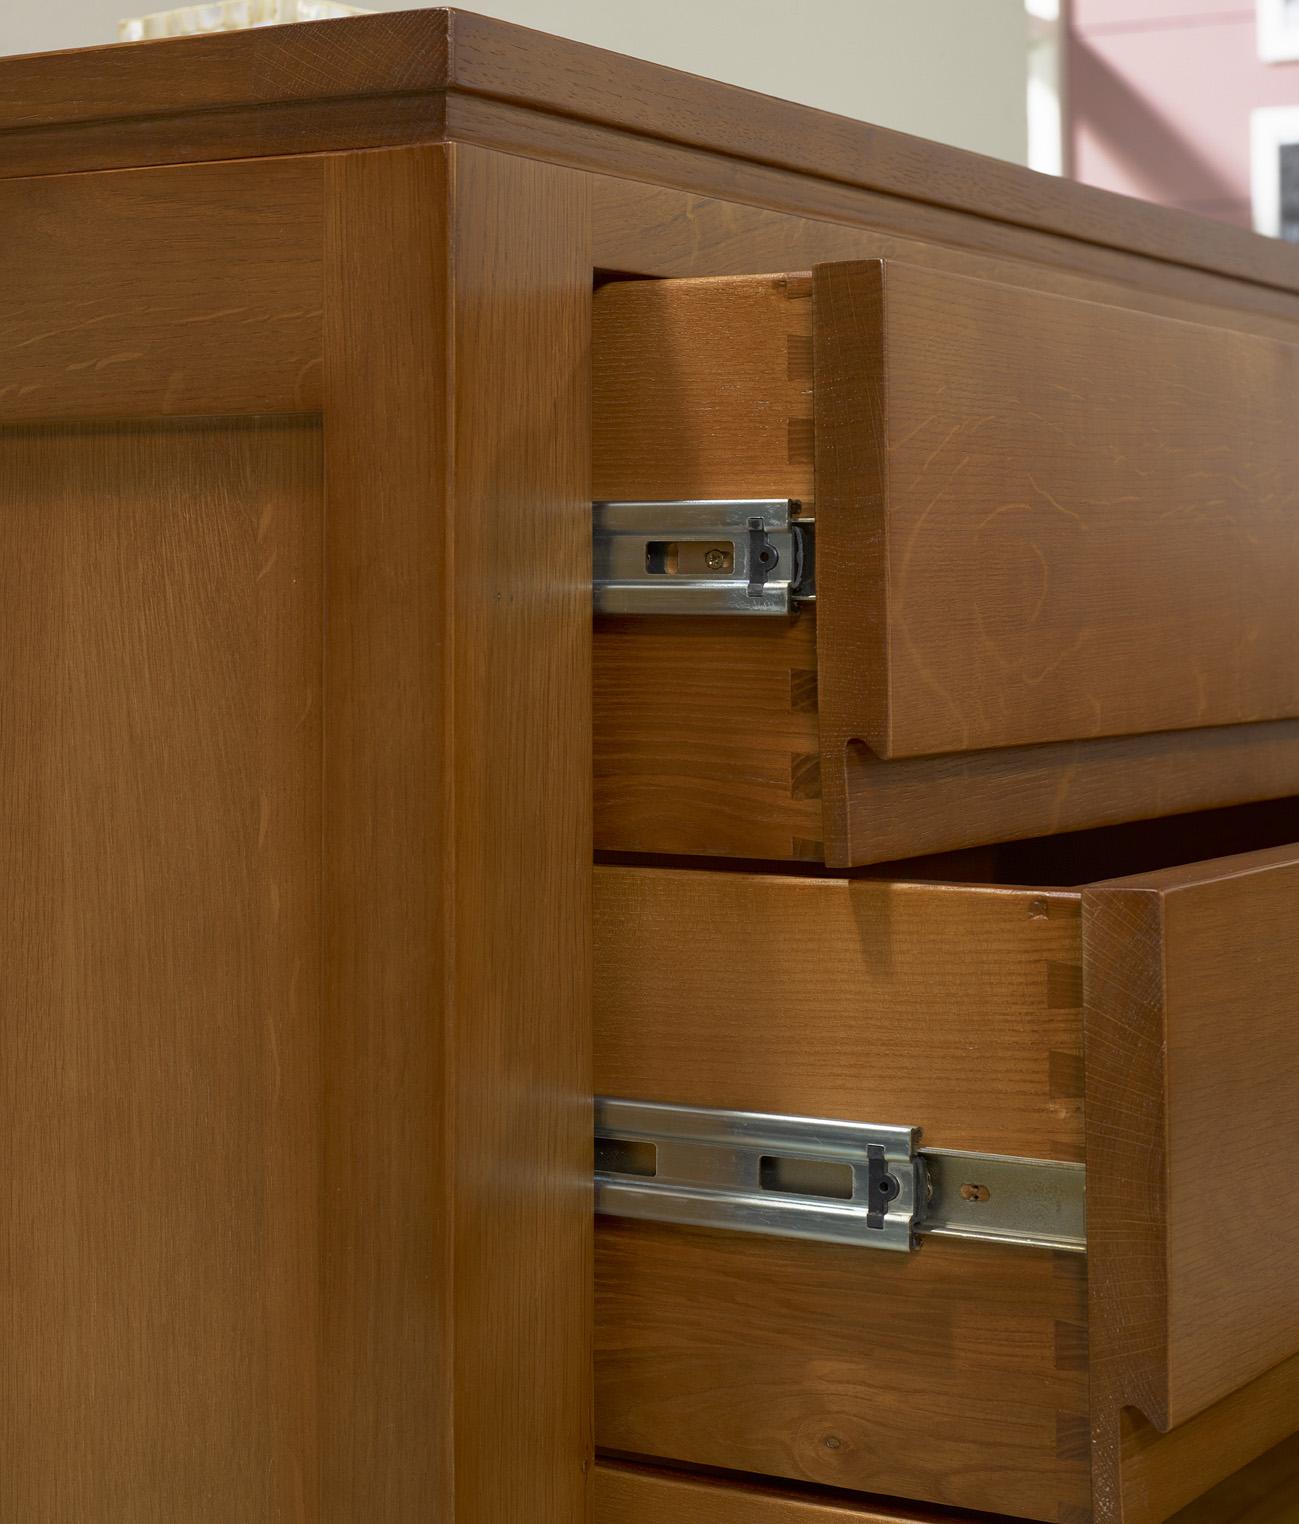 Commode 3 tiroirs en ch ne massif de style contemporain for Meuble contemporain chene massif